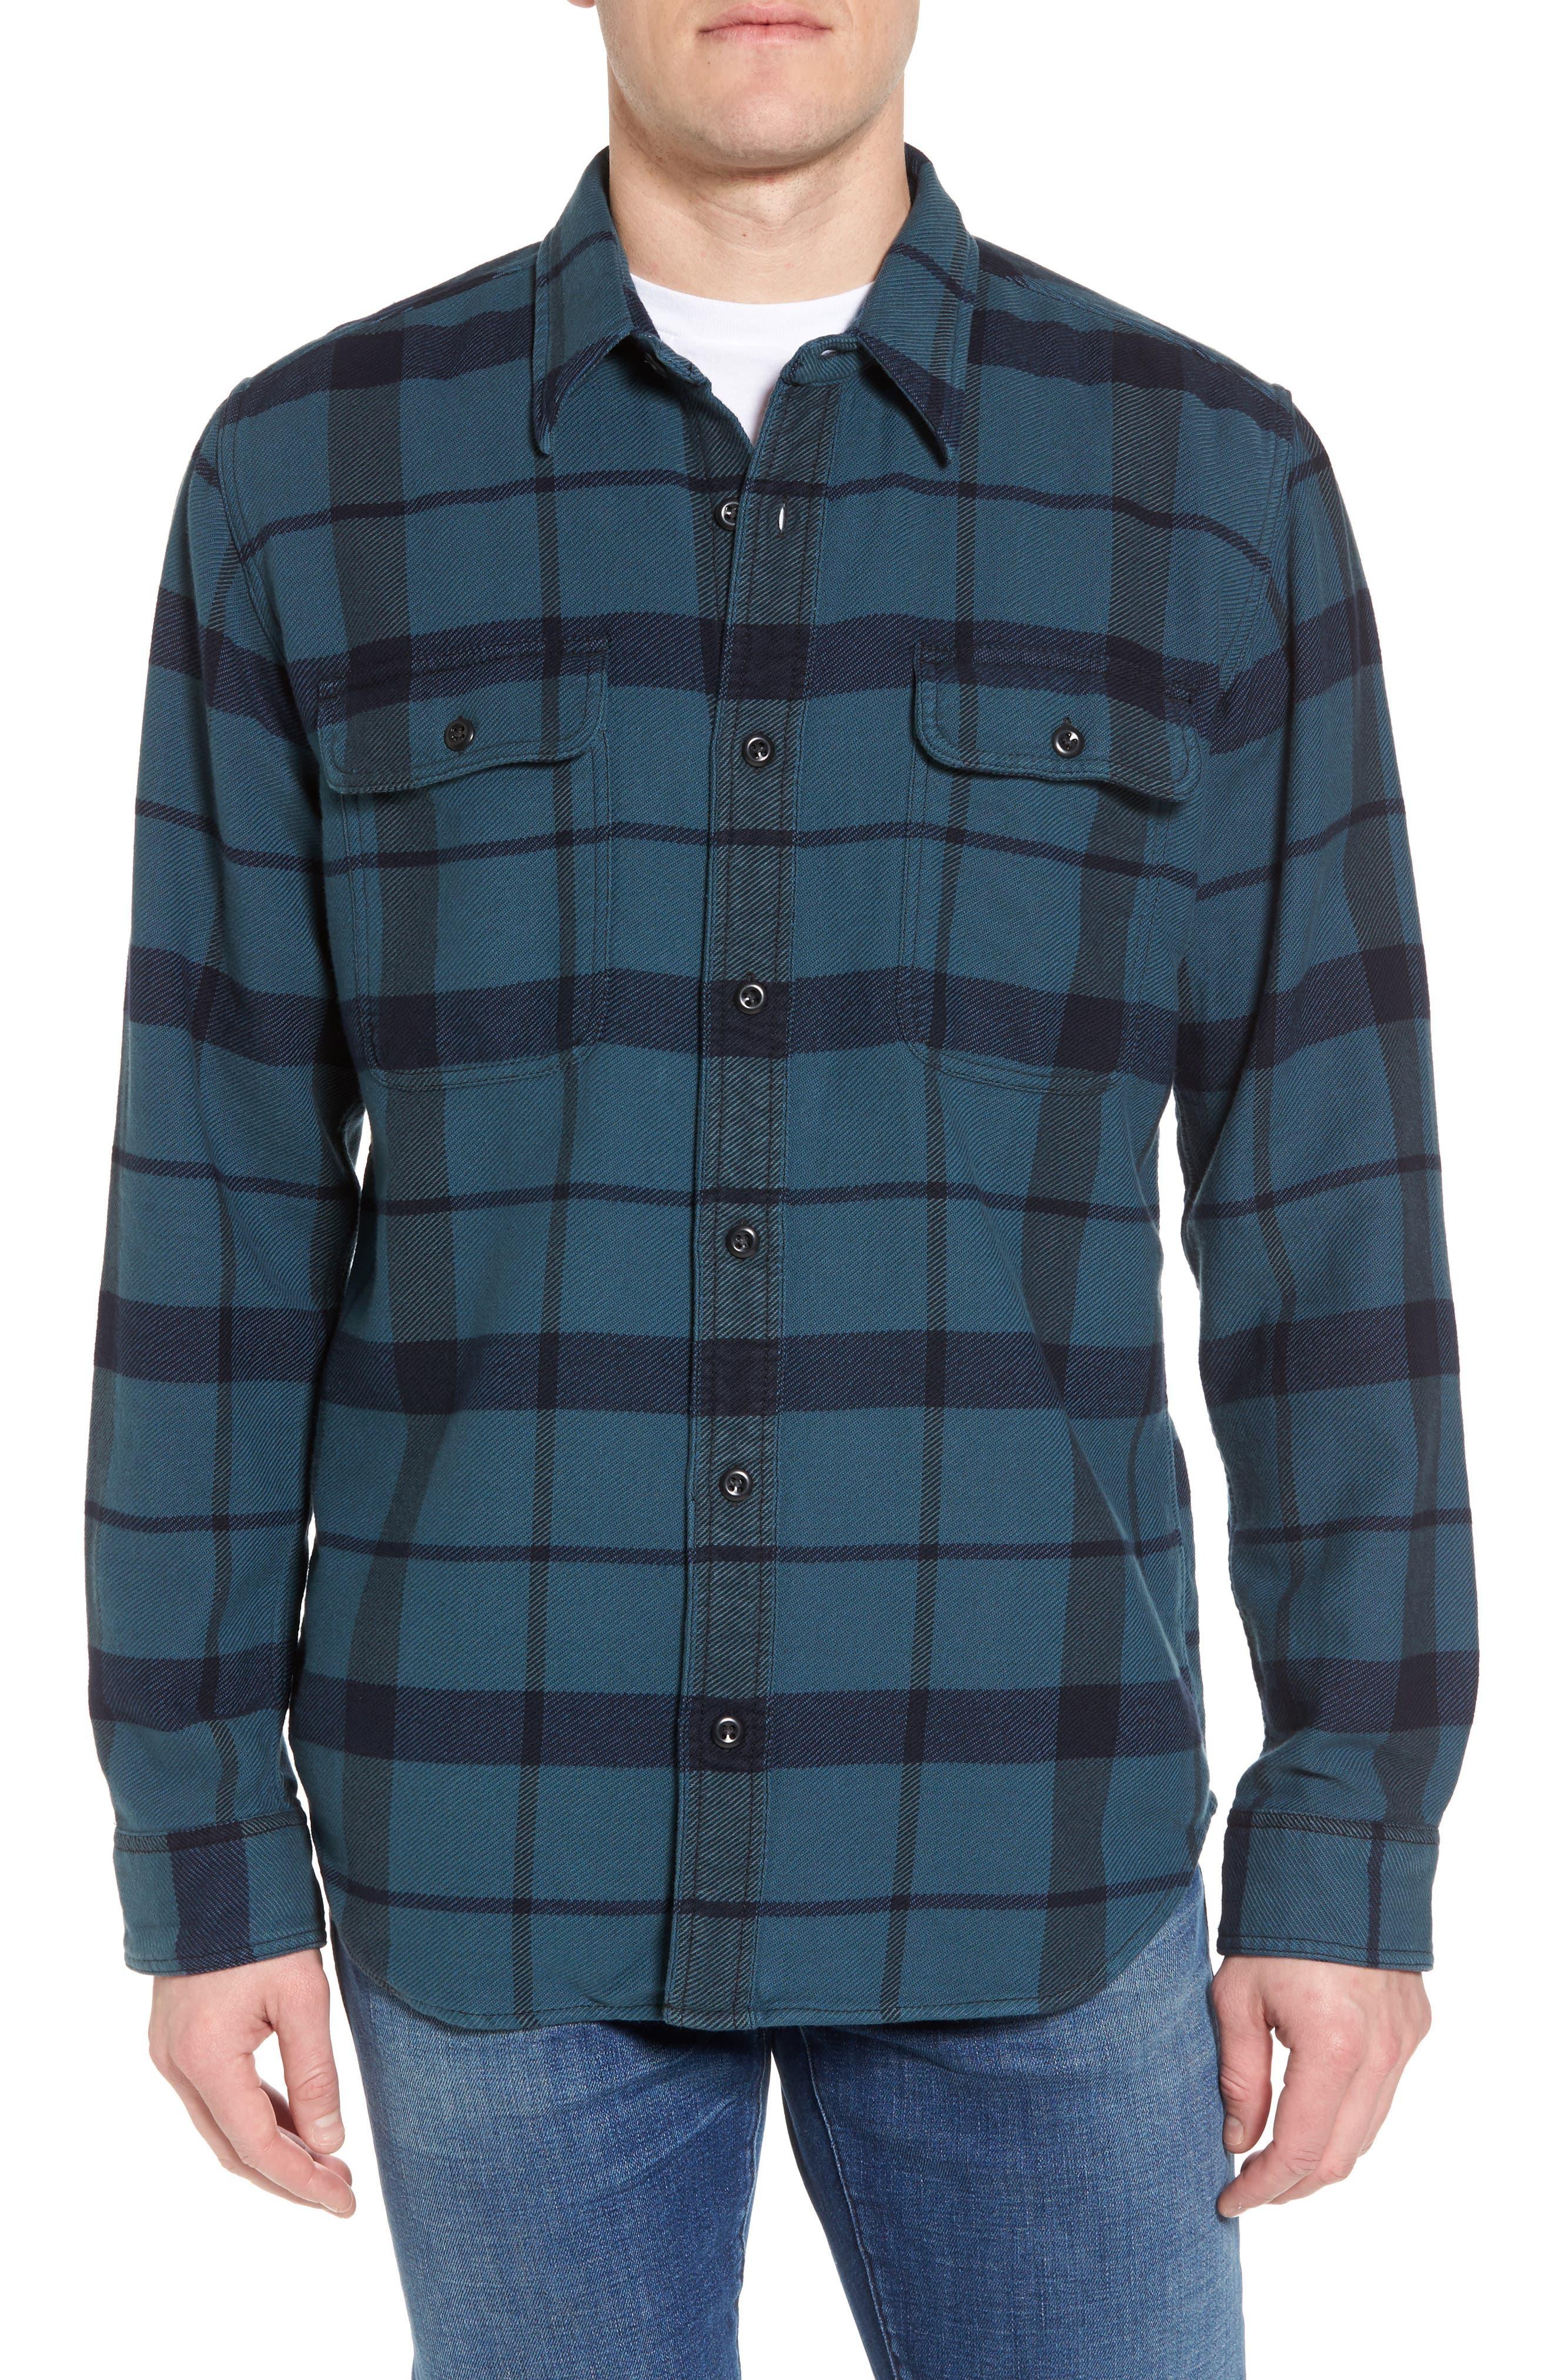 'Vintage Flannel' Regular Fit Plaid Cotton Shirt,                         Main,                         color, Brown/ Navy